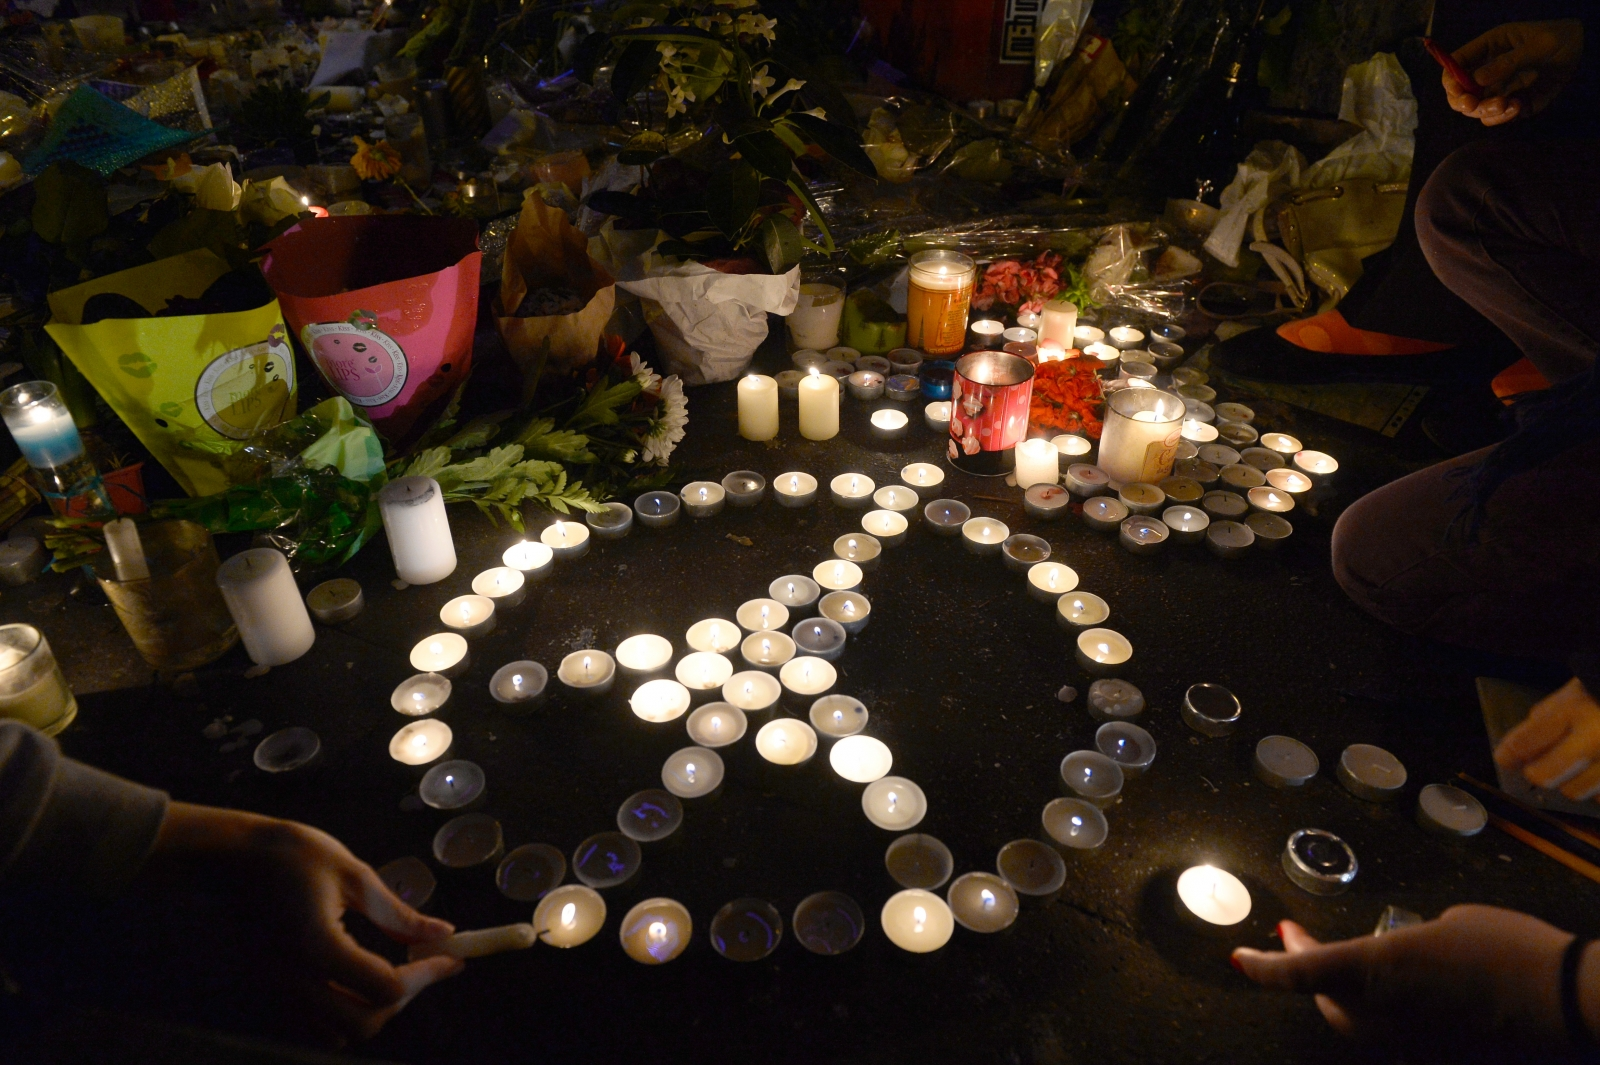 paris attacks anniversary